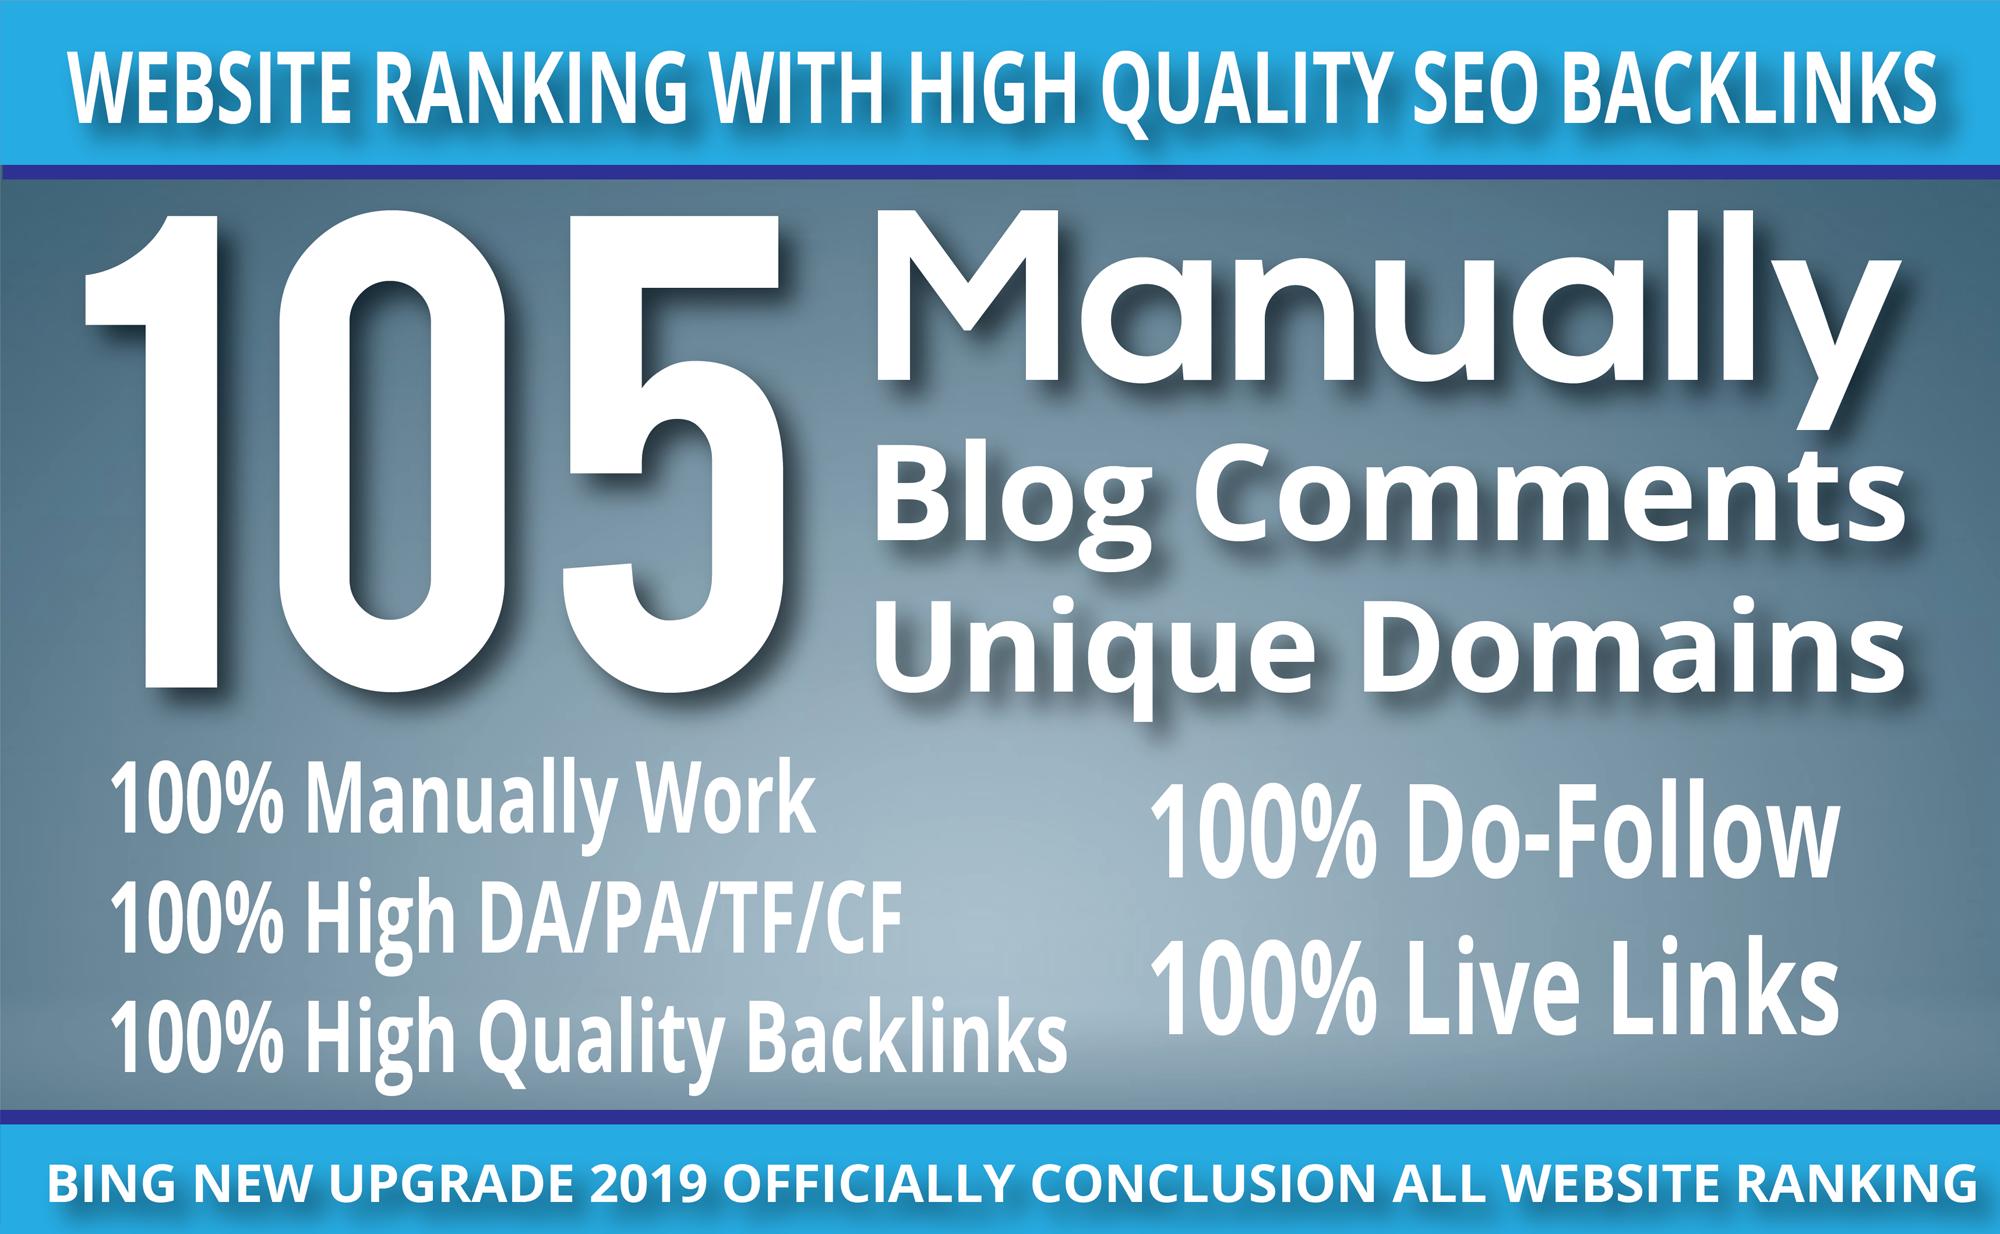 I Do 105 blog comment Seo backlinks ON unique domains